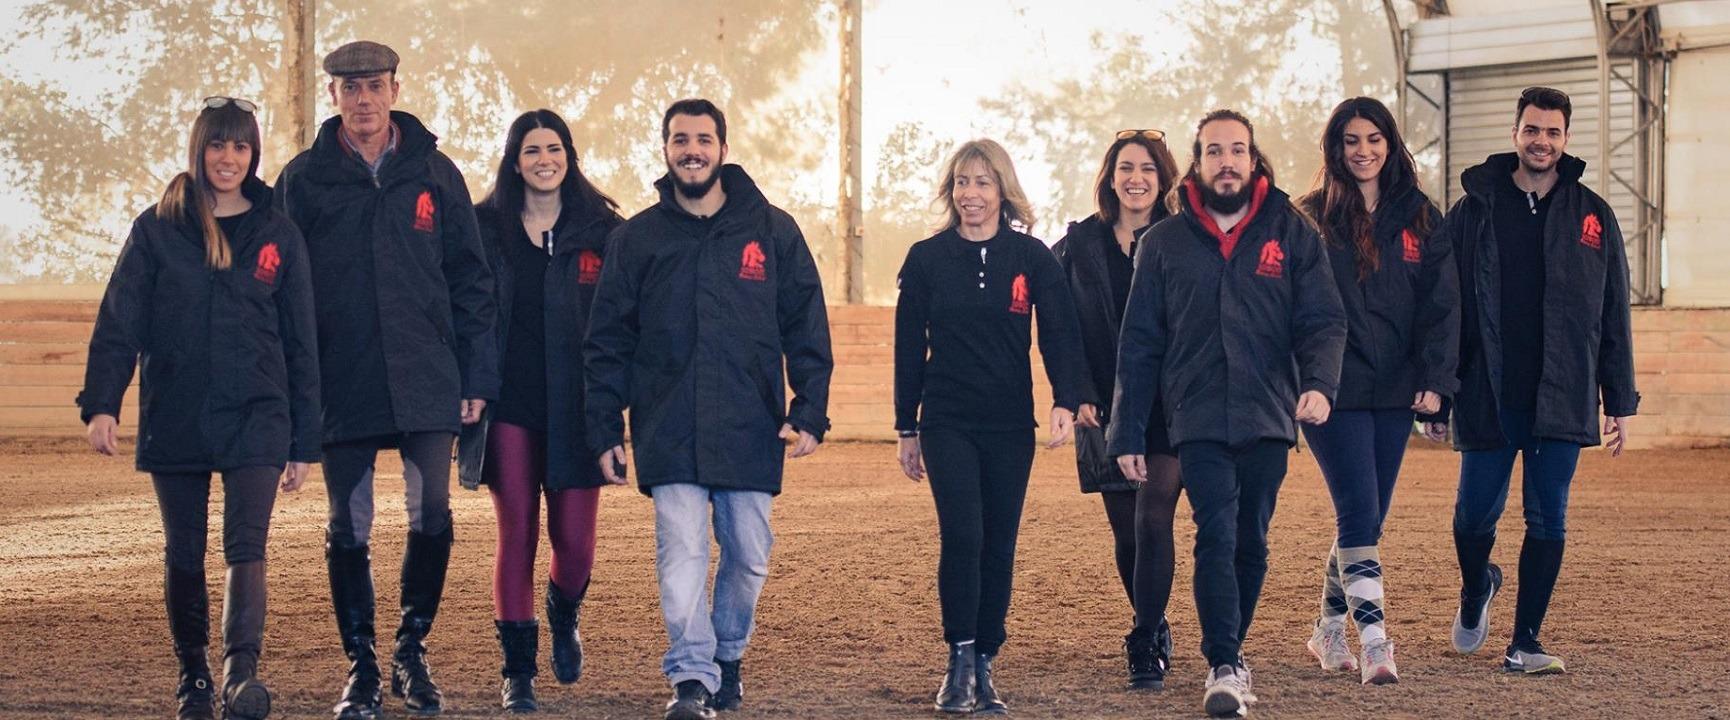 sxoli-ippasias-team